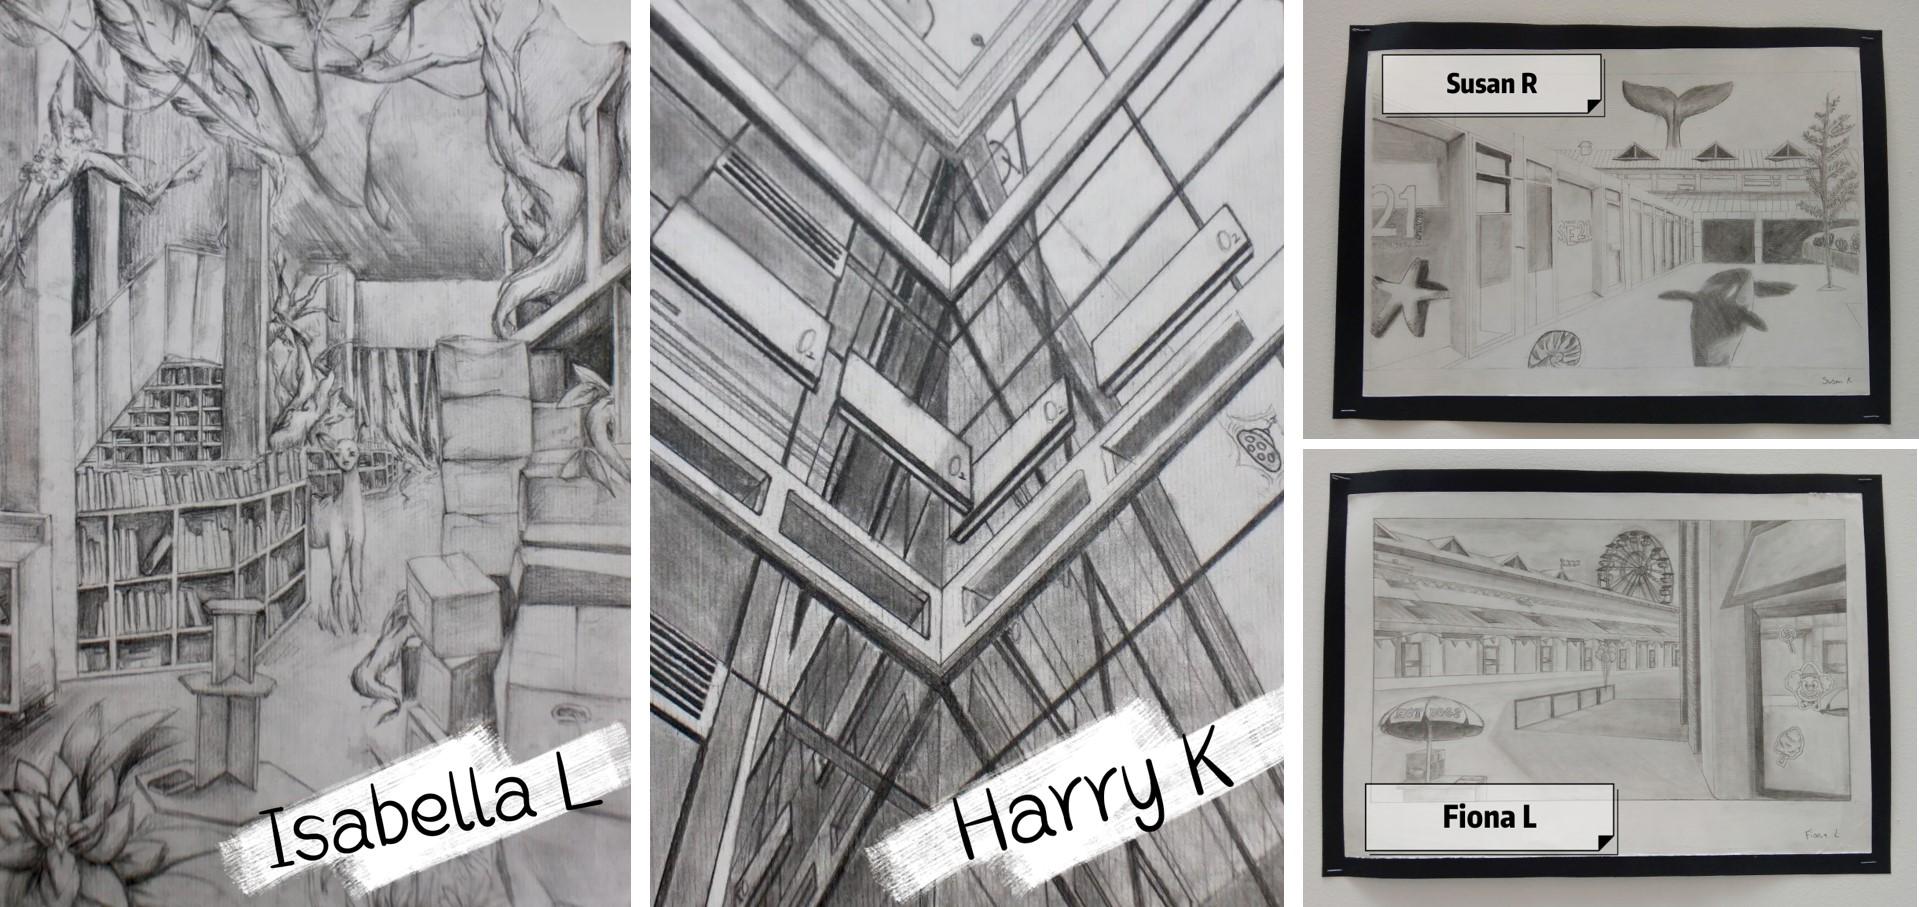 year-9-surrealist-spaces-artworks-20190528-115814-366